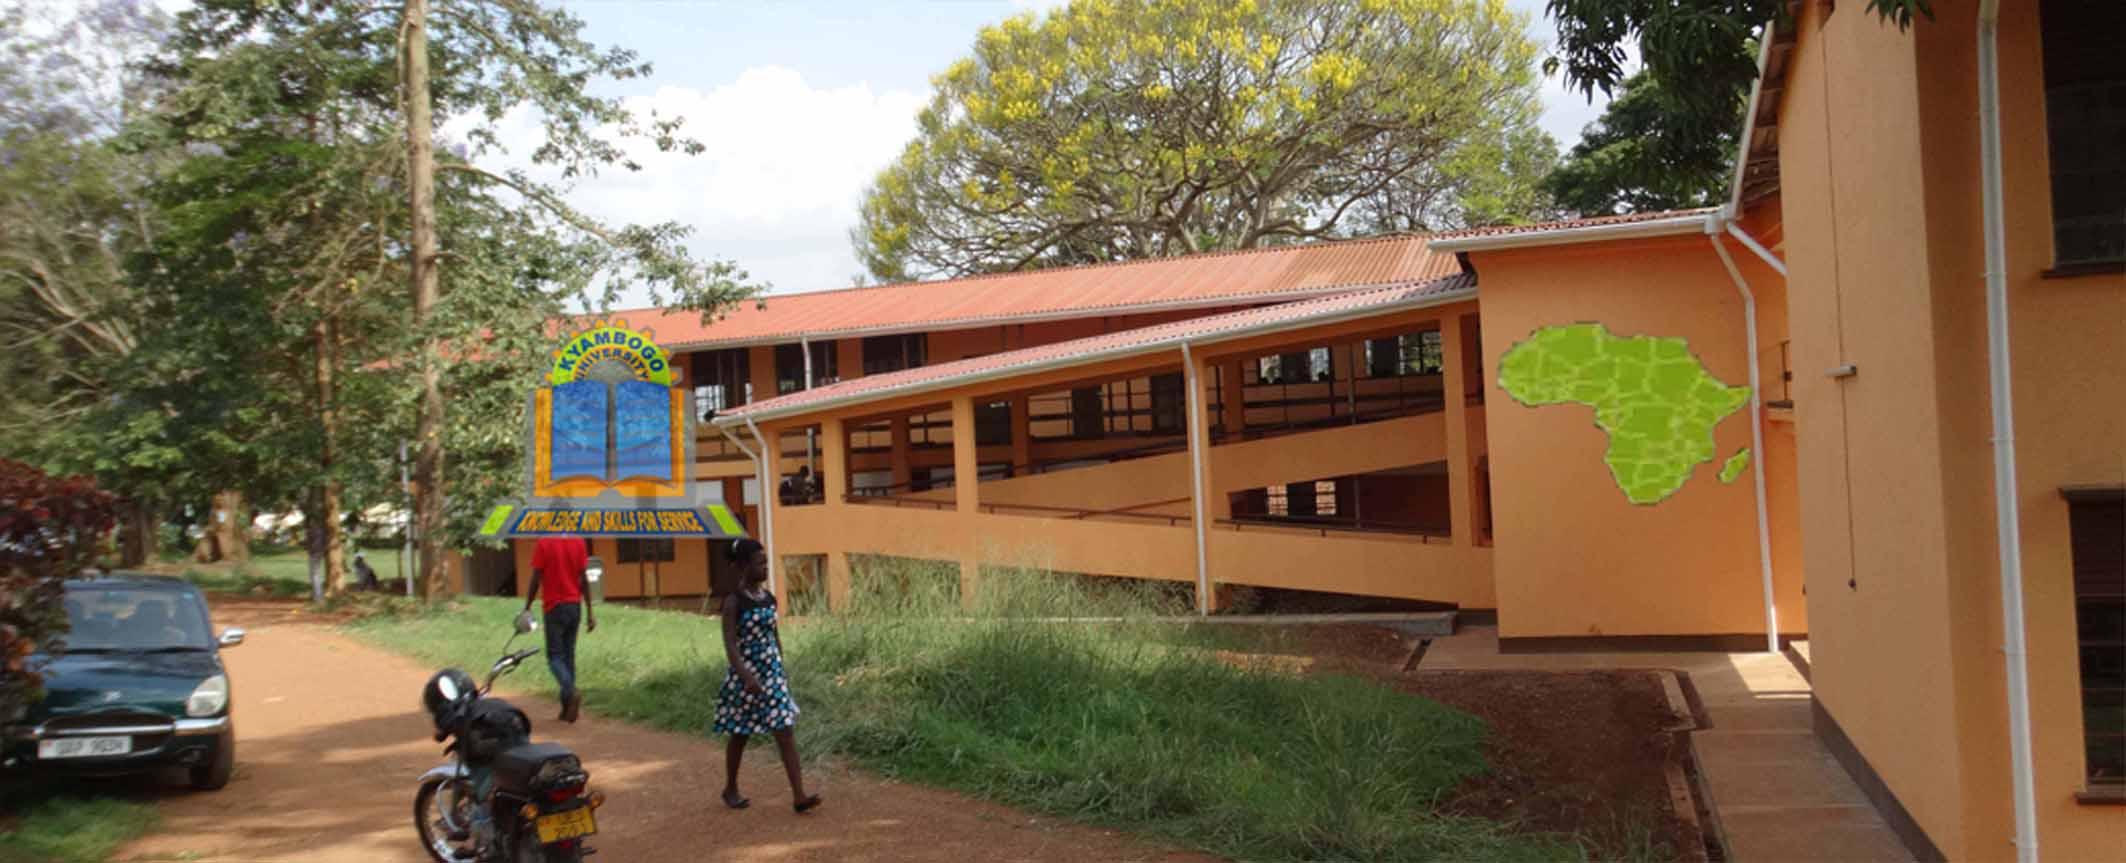 Kyambogo University Application Form Download